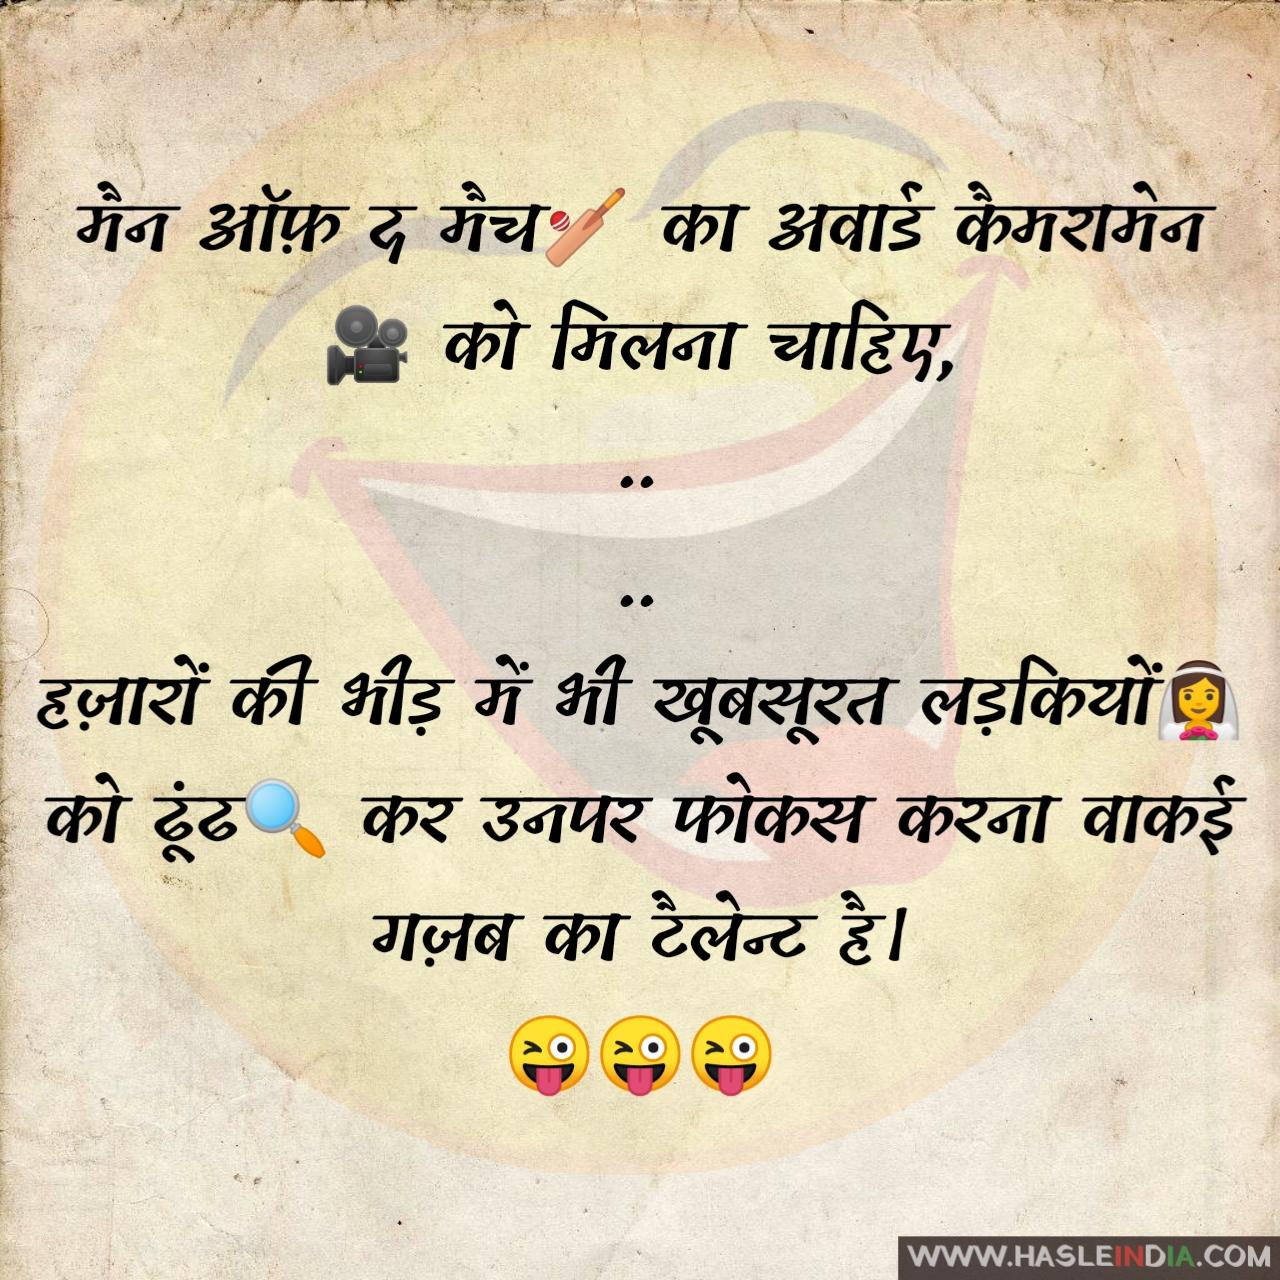 Cricket jokes images, cricket jokes in hindi, Cricket jokes, jokes in hindi, funny hindi jokes, Hindi jokes, hindi chutkule, hindi joke sms, hindi jokes pic, hindi jokes images, Hasle india,